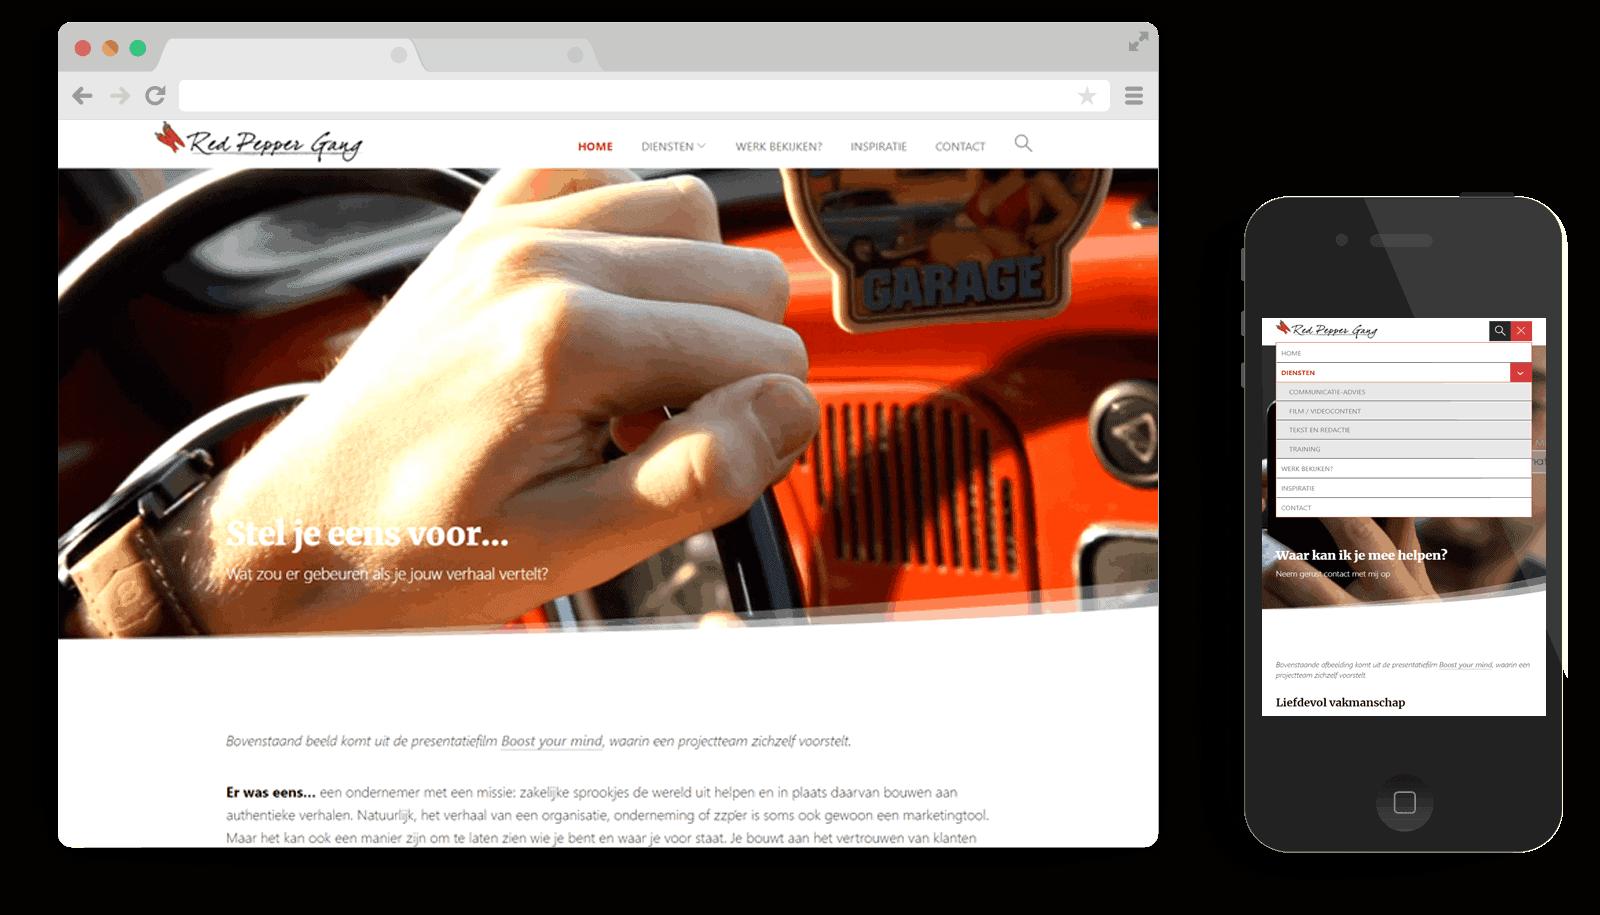 responsive WordPress theme Redpeppergang.com